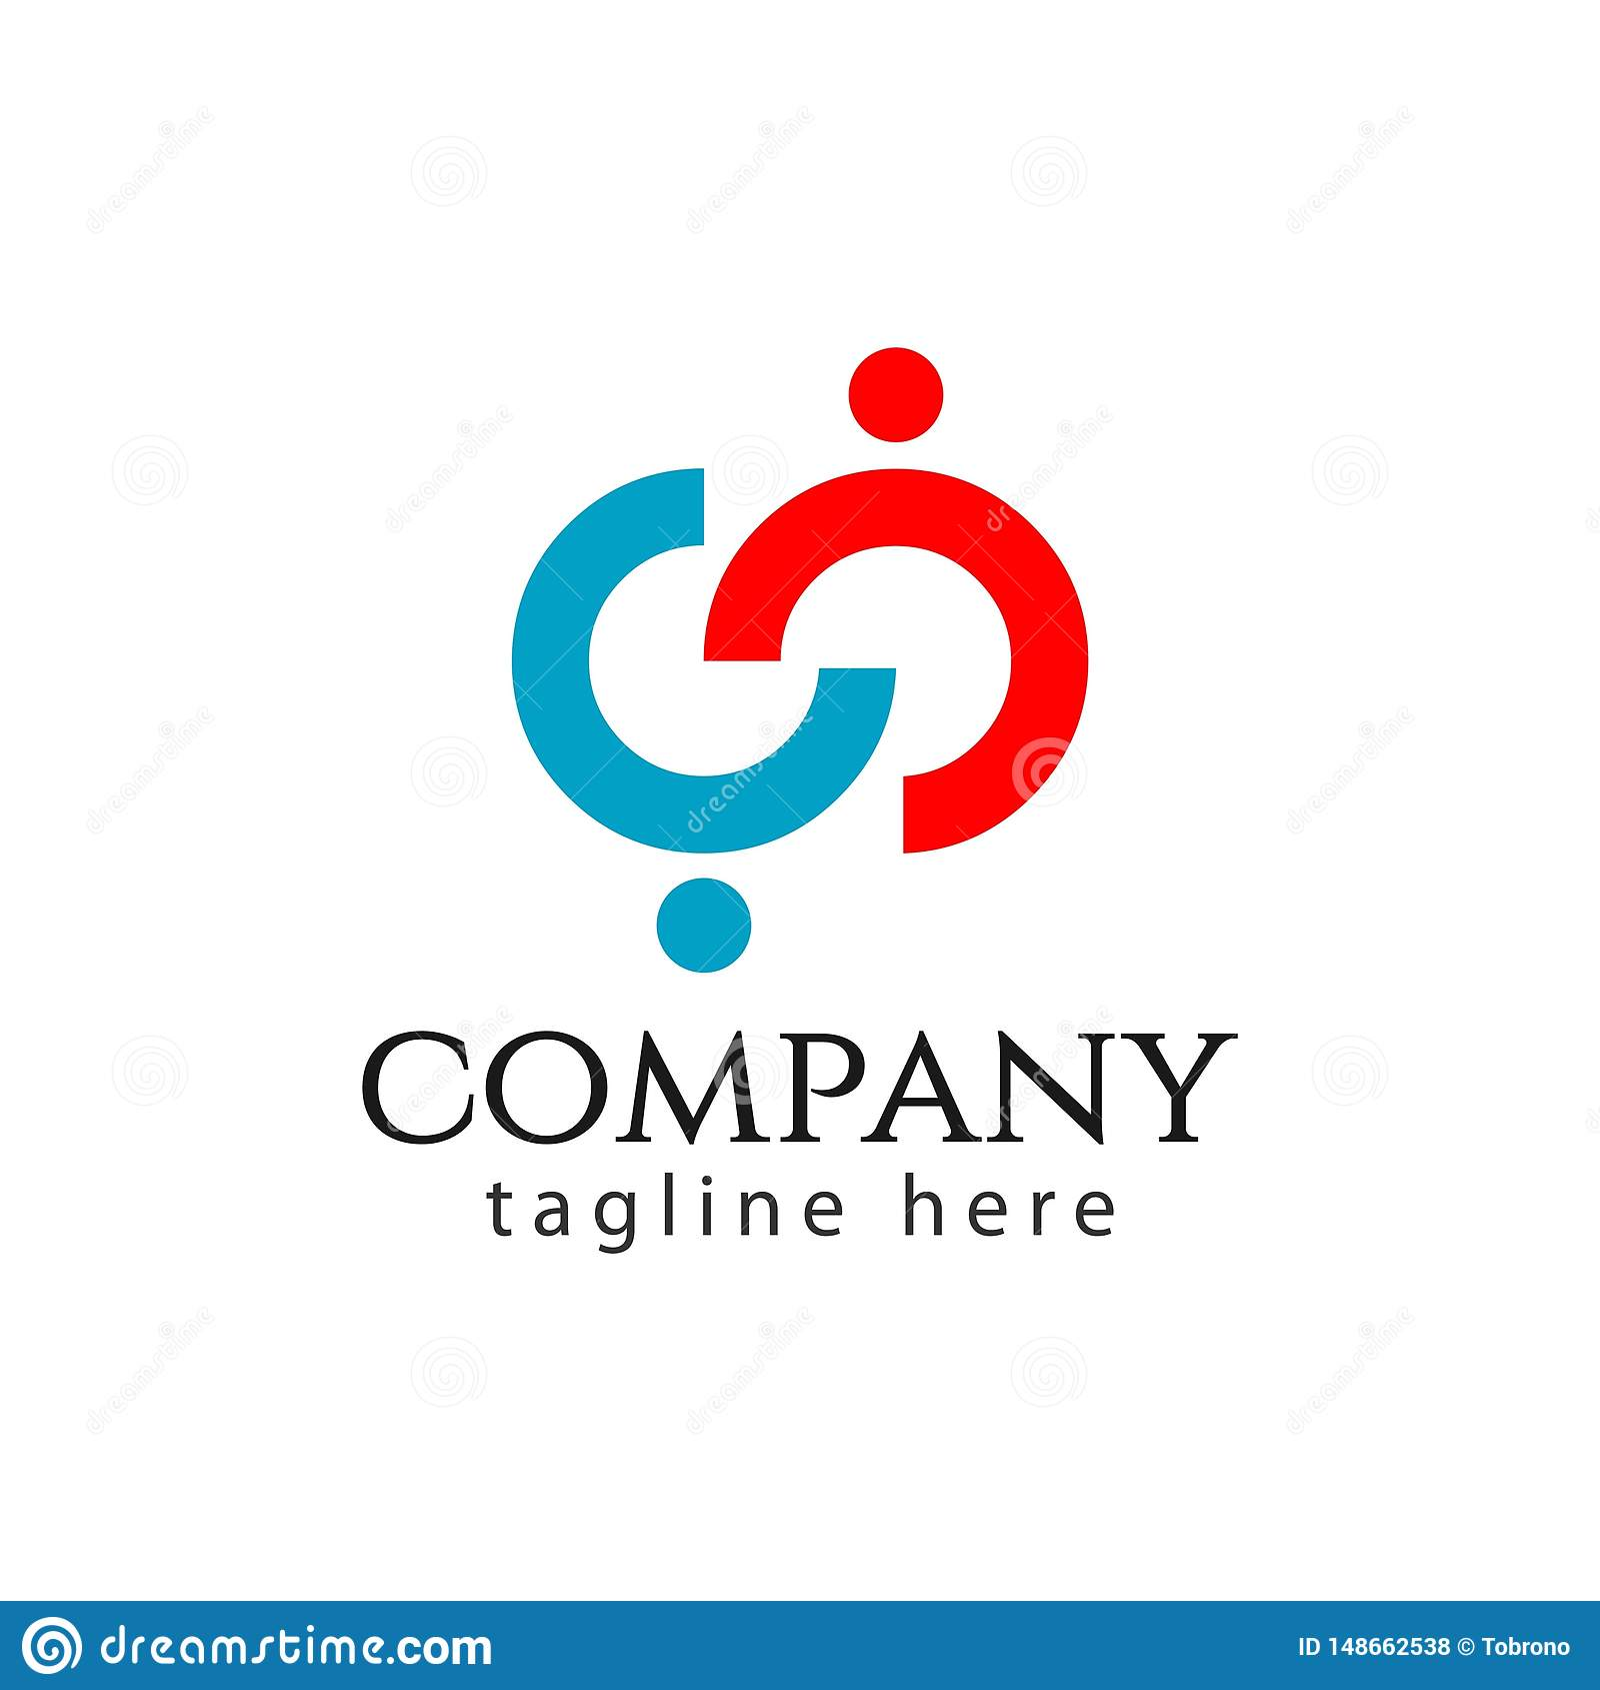 CC Company Logo Vector Template Design Illustration